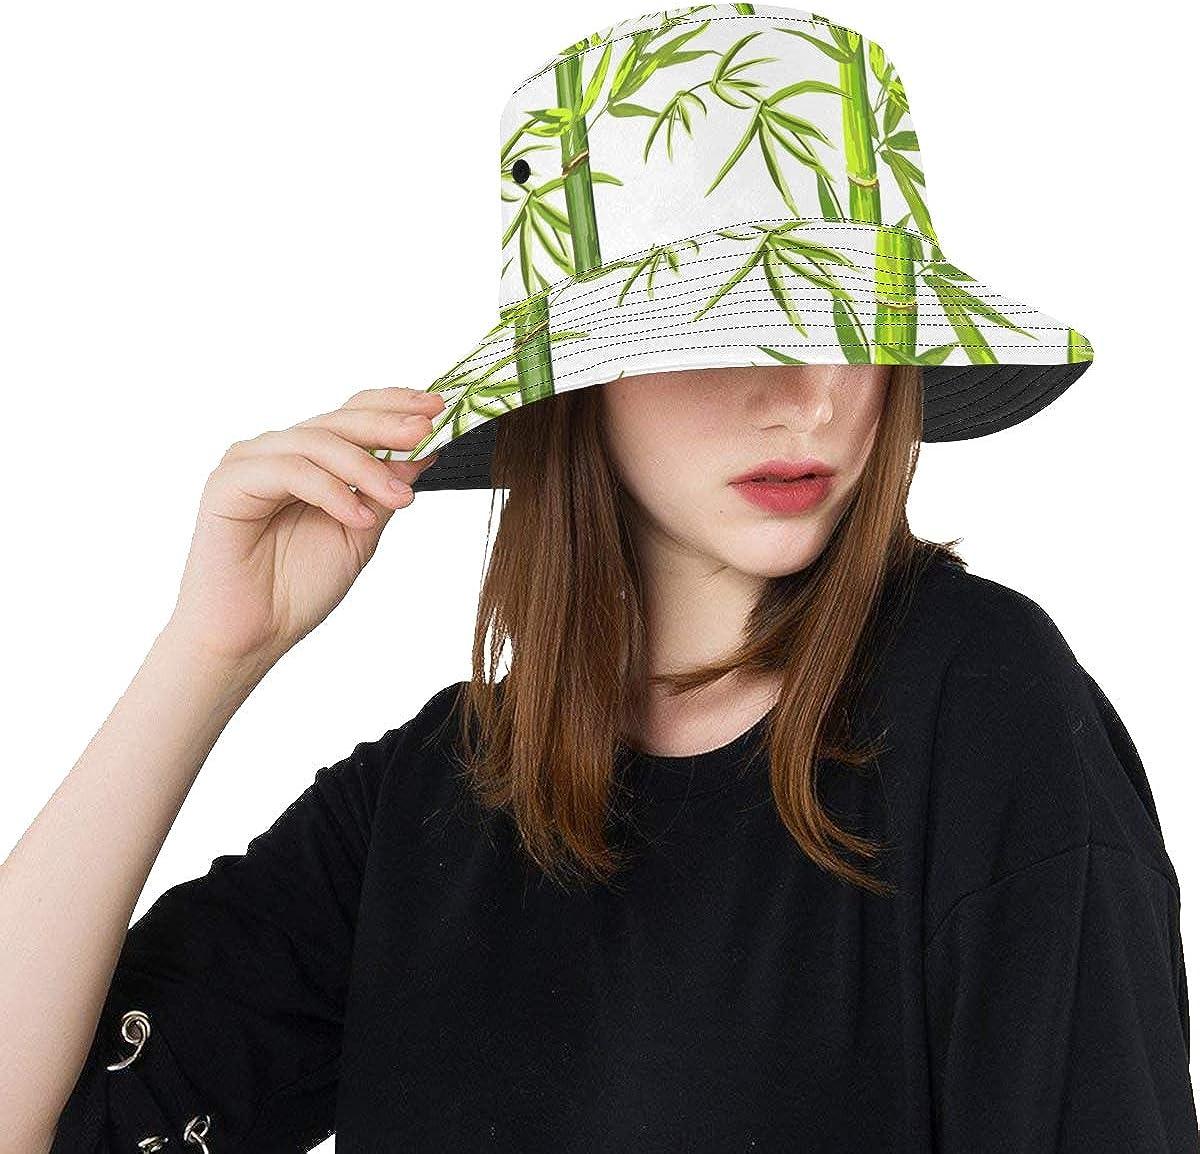 Outdoor Hat for Girls Nature Fresh Tropical Rainforest Bamboo Summer Unisex Fishing Sun Top Bucket Hats for Teens Women Fisherman Cap Outdoor Sport Sun Hat Kids Girls